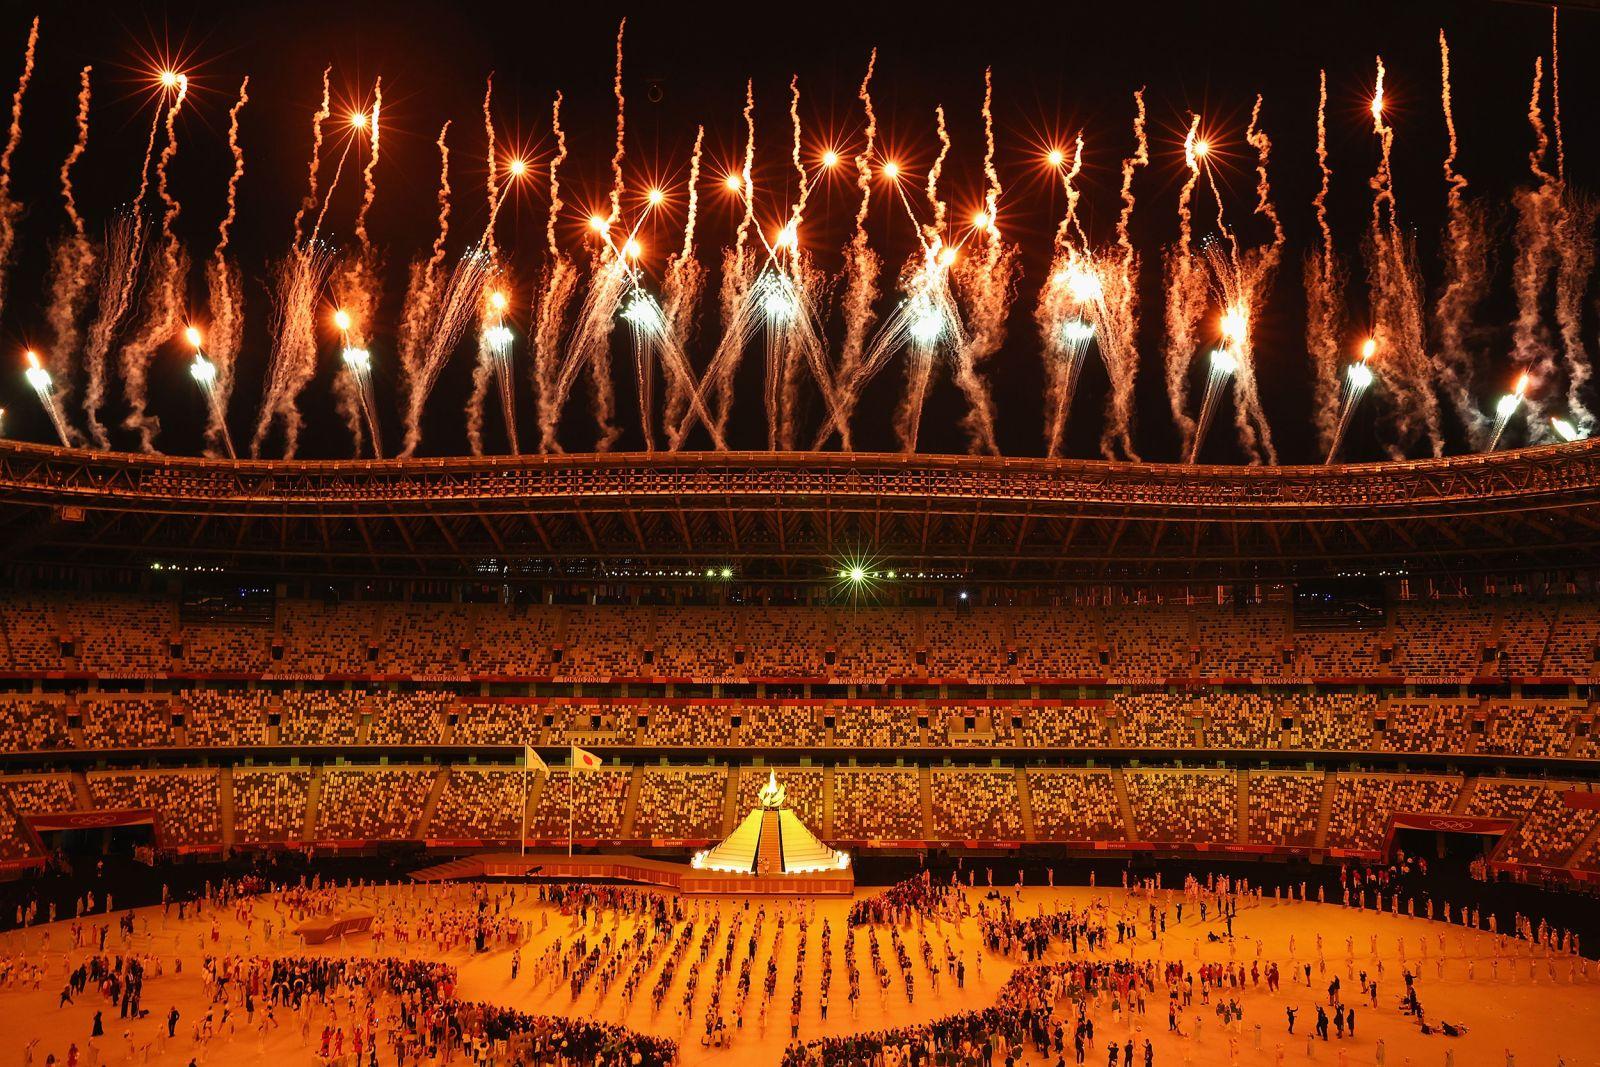 Fireworks go off after Naomi Osaka lit the Olympic cauldron.